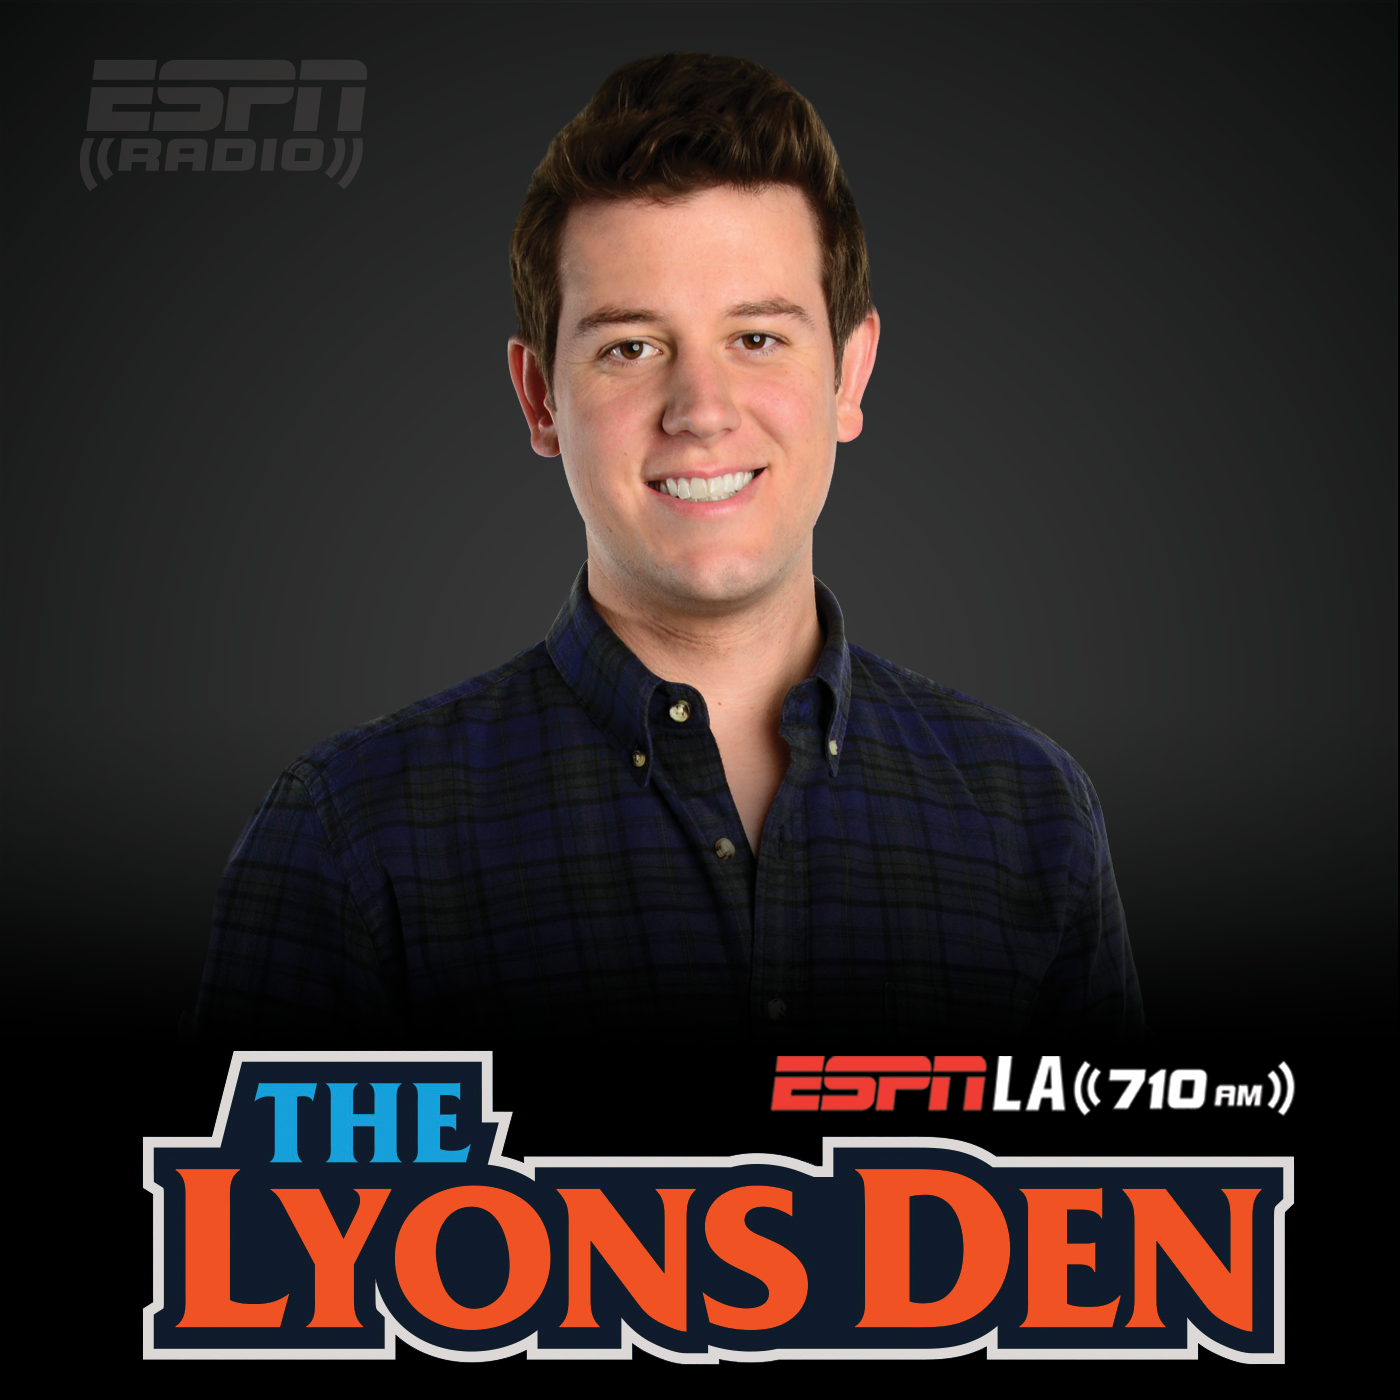 ESPN LA: The Lyons Den